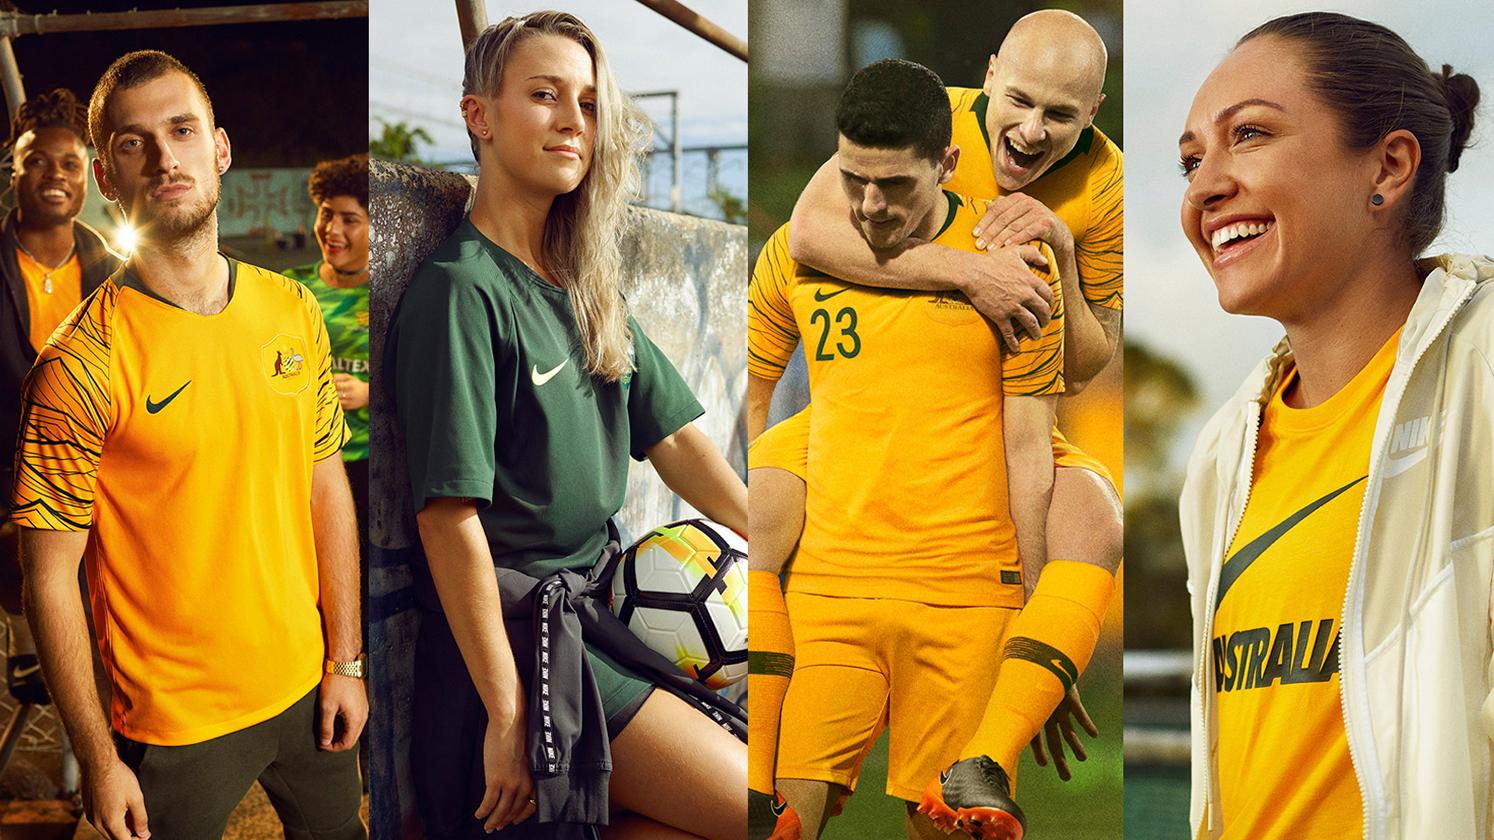 Nike-News-2018-Australia-Jersey-Group_hd_1600_78617